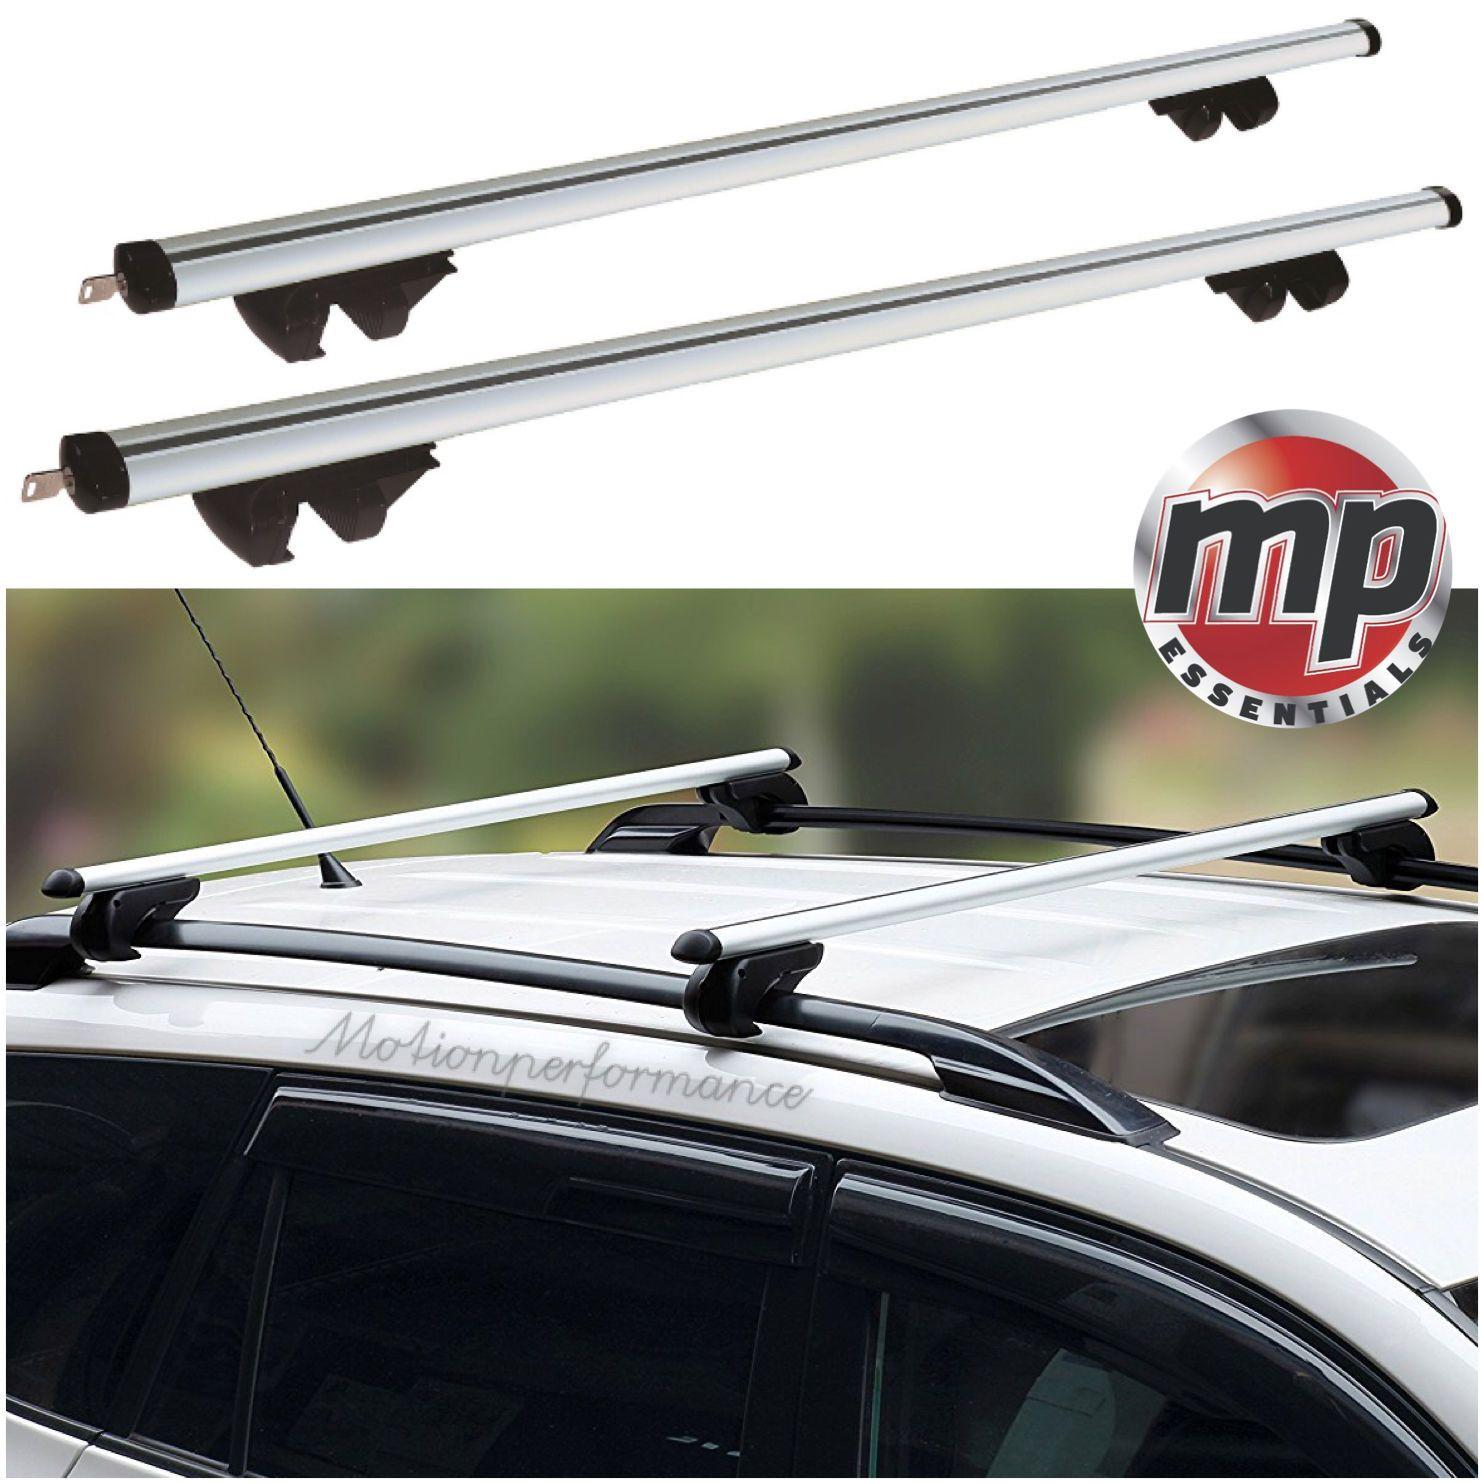 Streetwize Universal 135cm Lockable Aluminium Roof Rack Bars For Cars With Rails Car Roof Racks Roof Rack Aluminum Roof